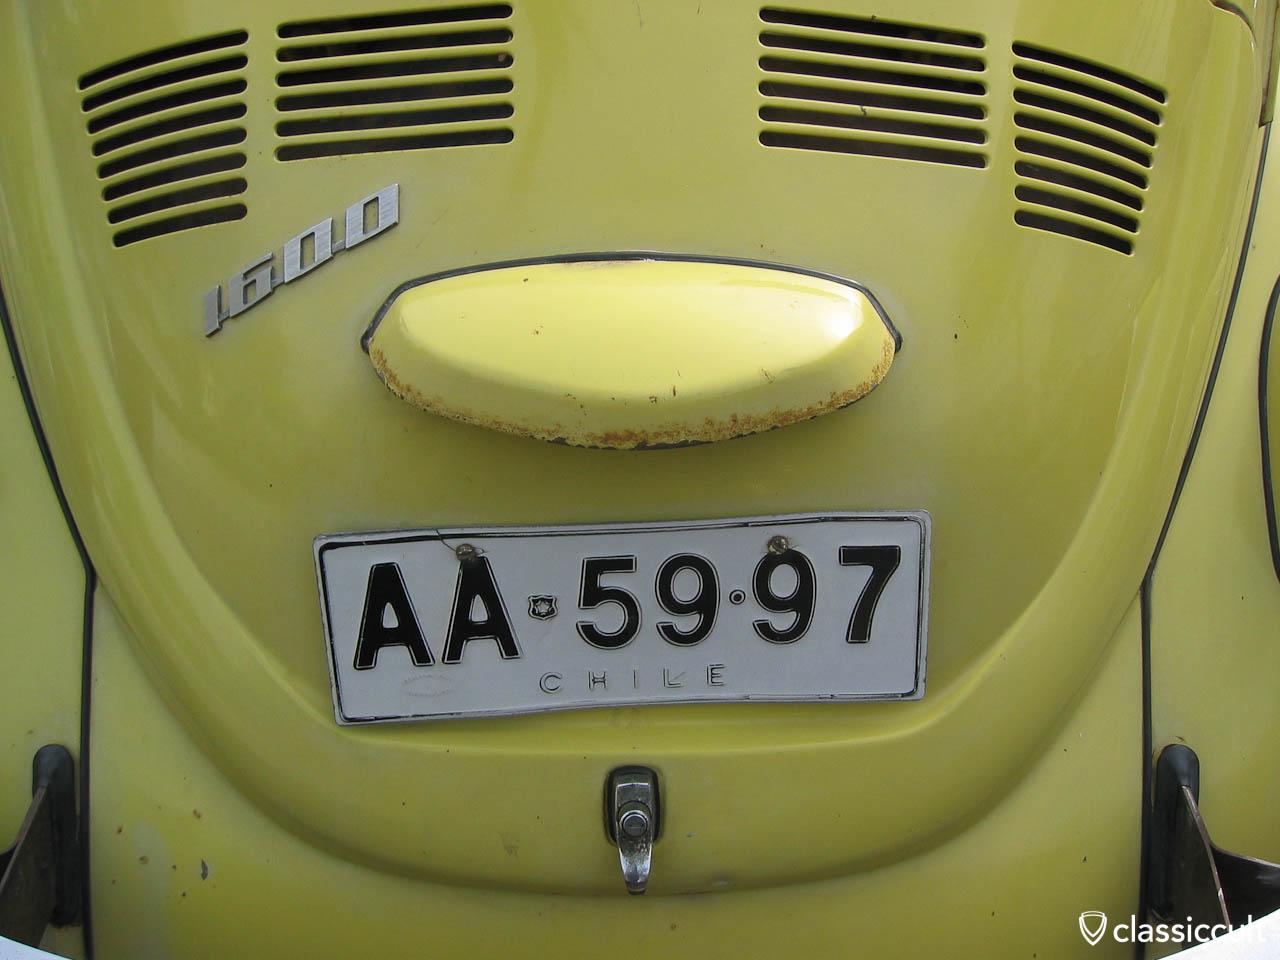 VW Bug 1600 Arica Chile